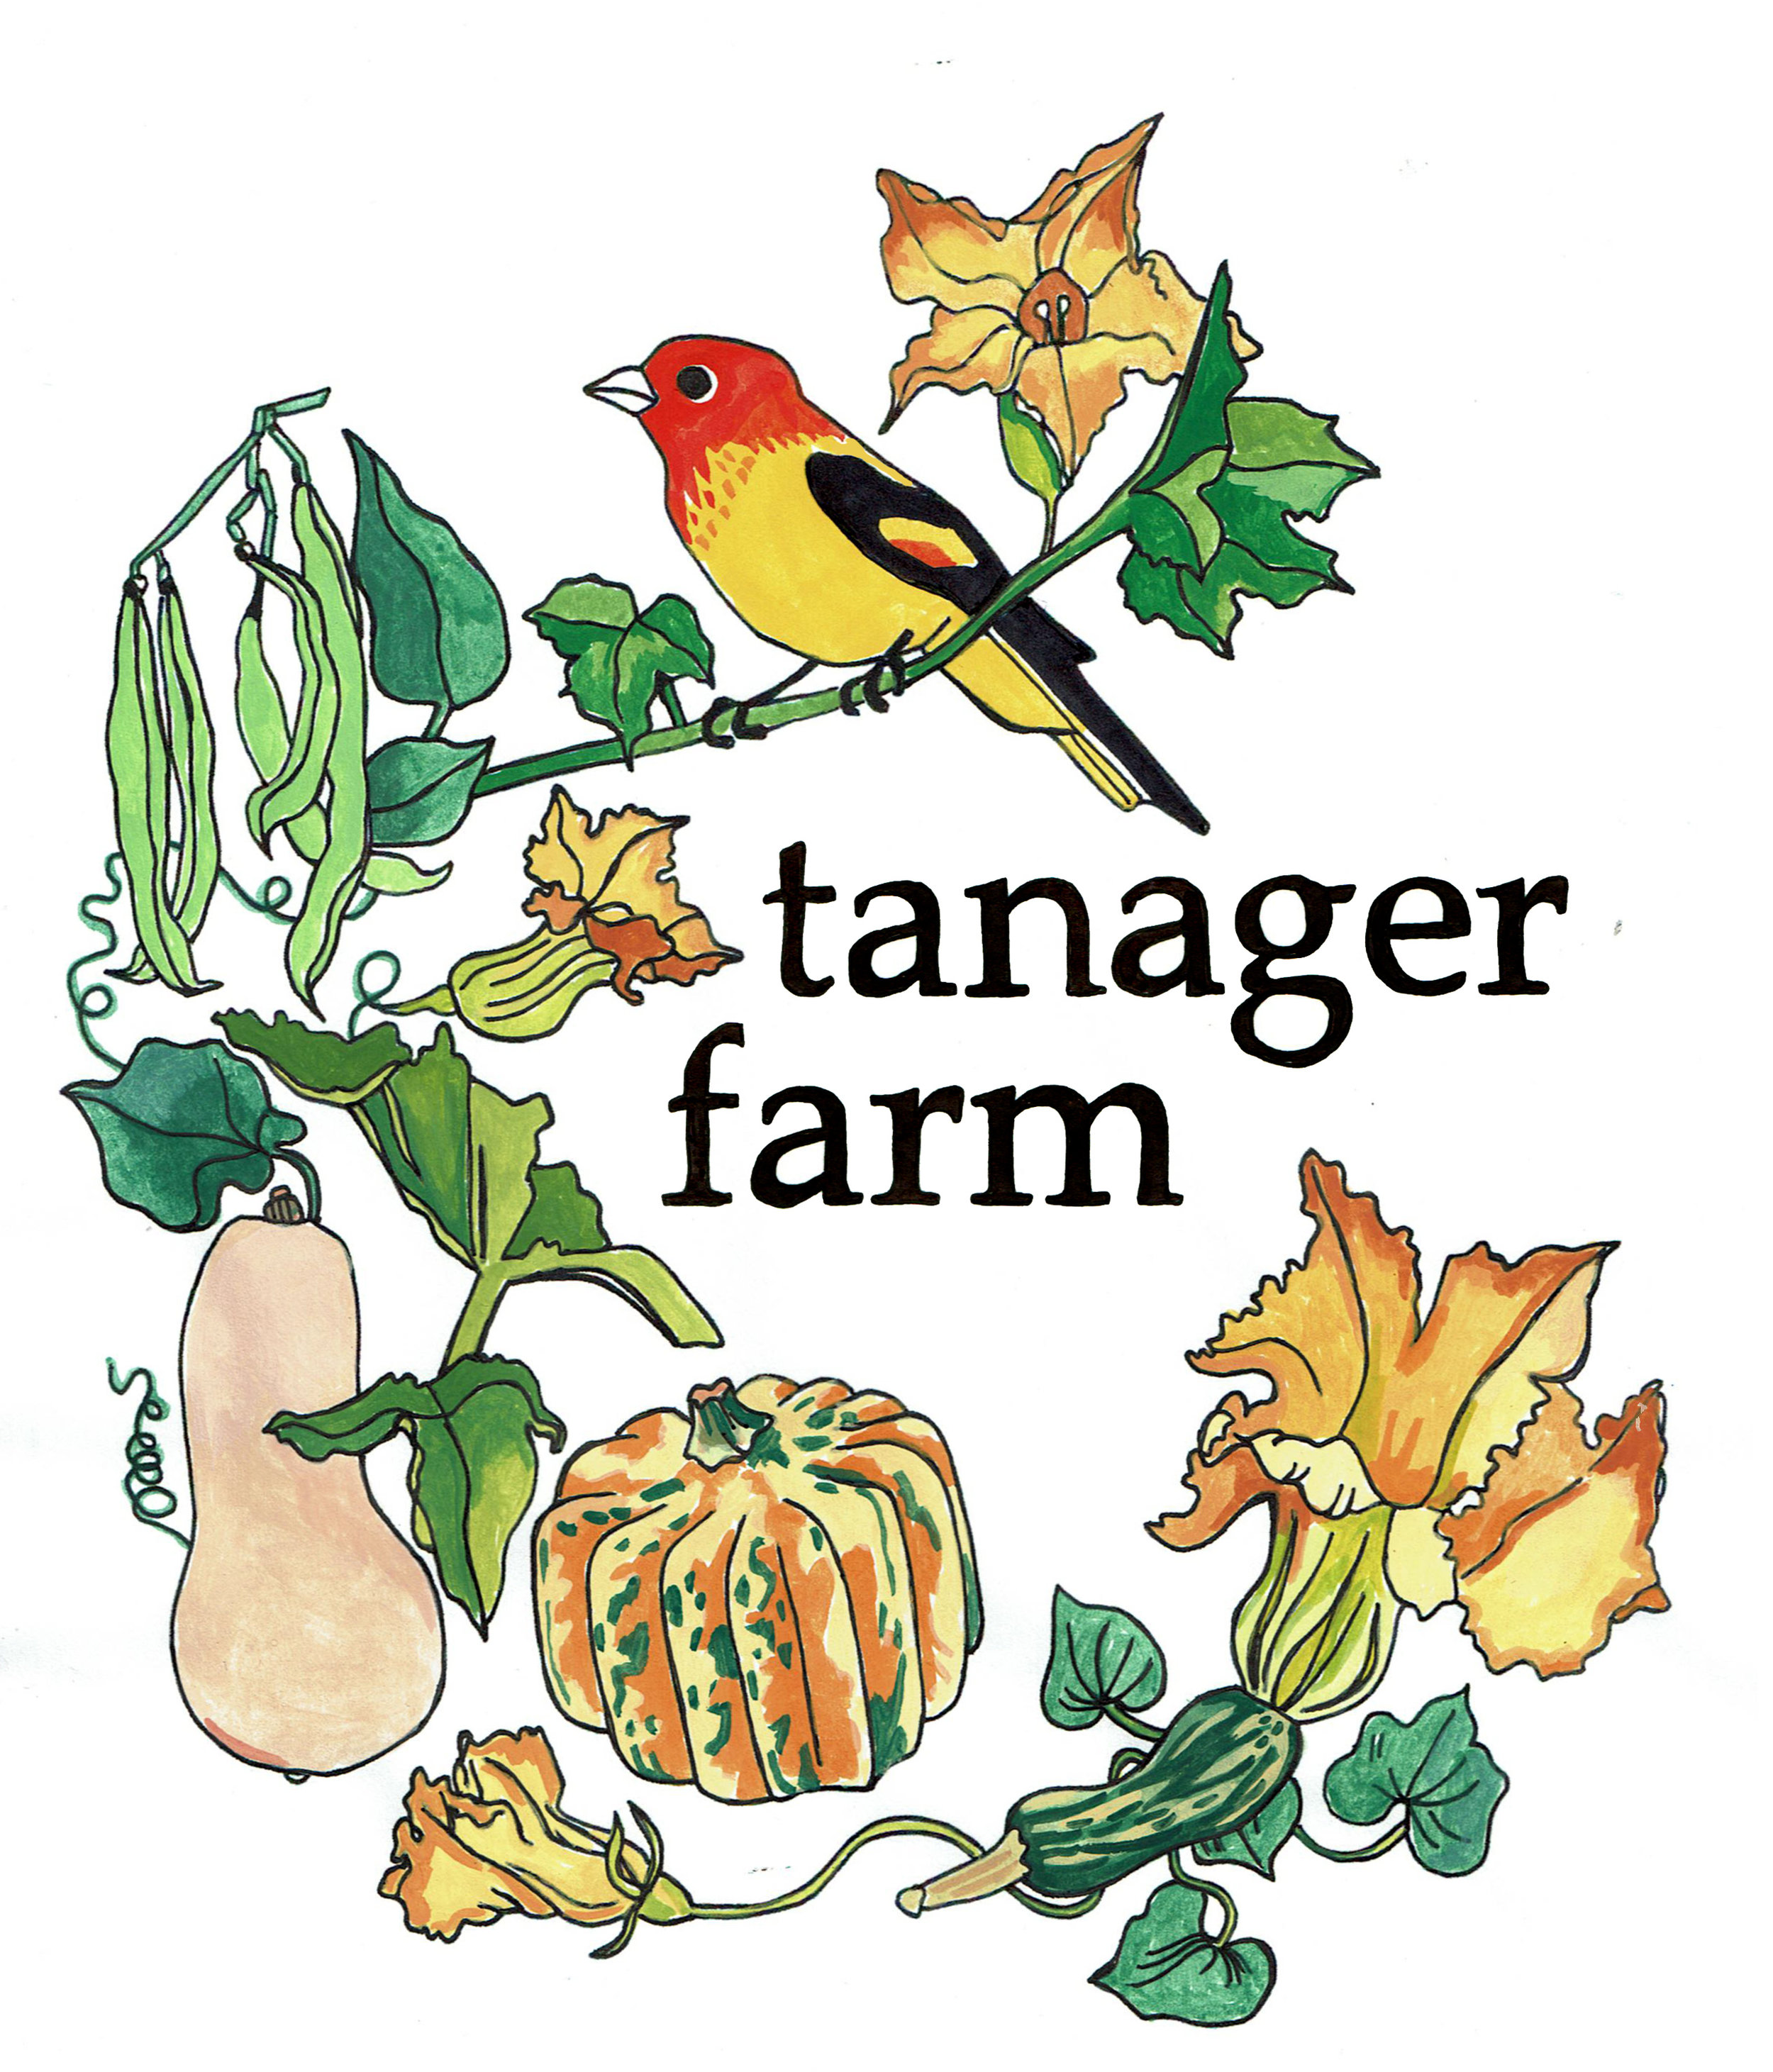 tanager farm final color.jpg